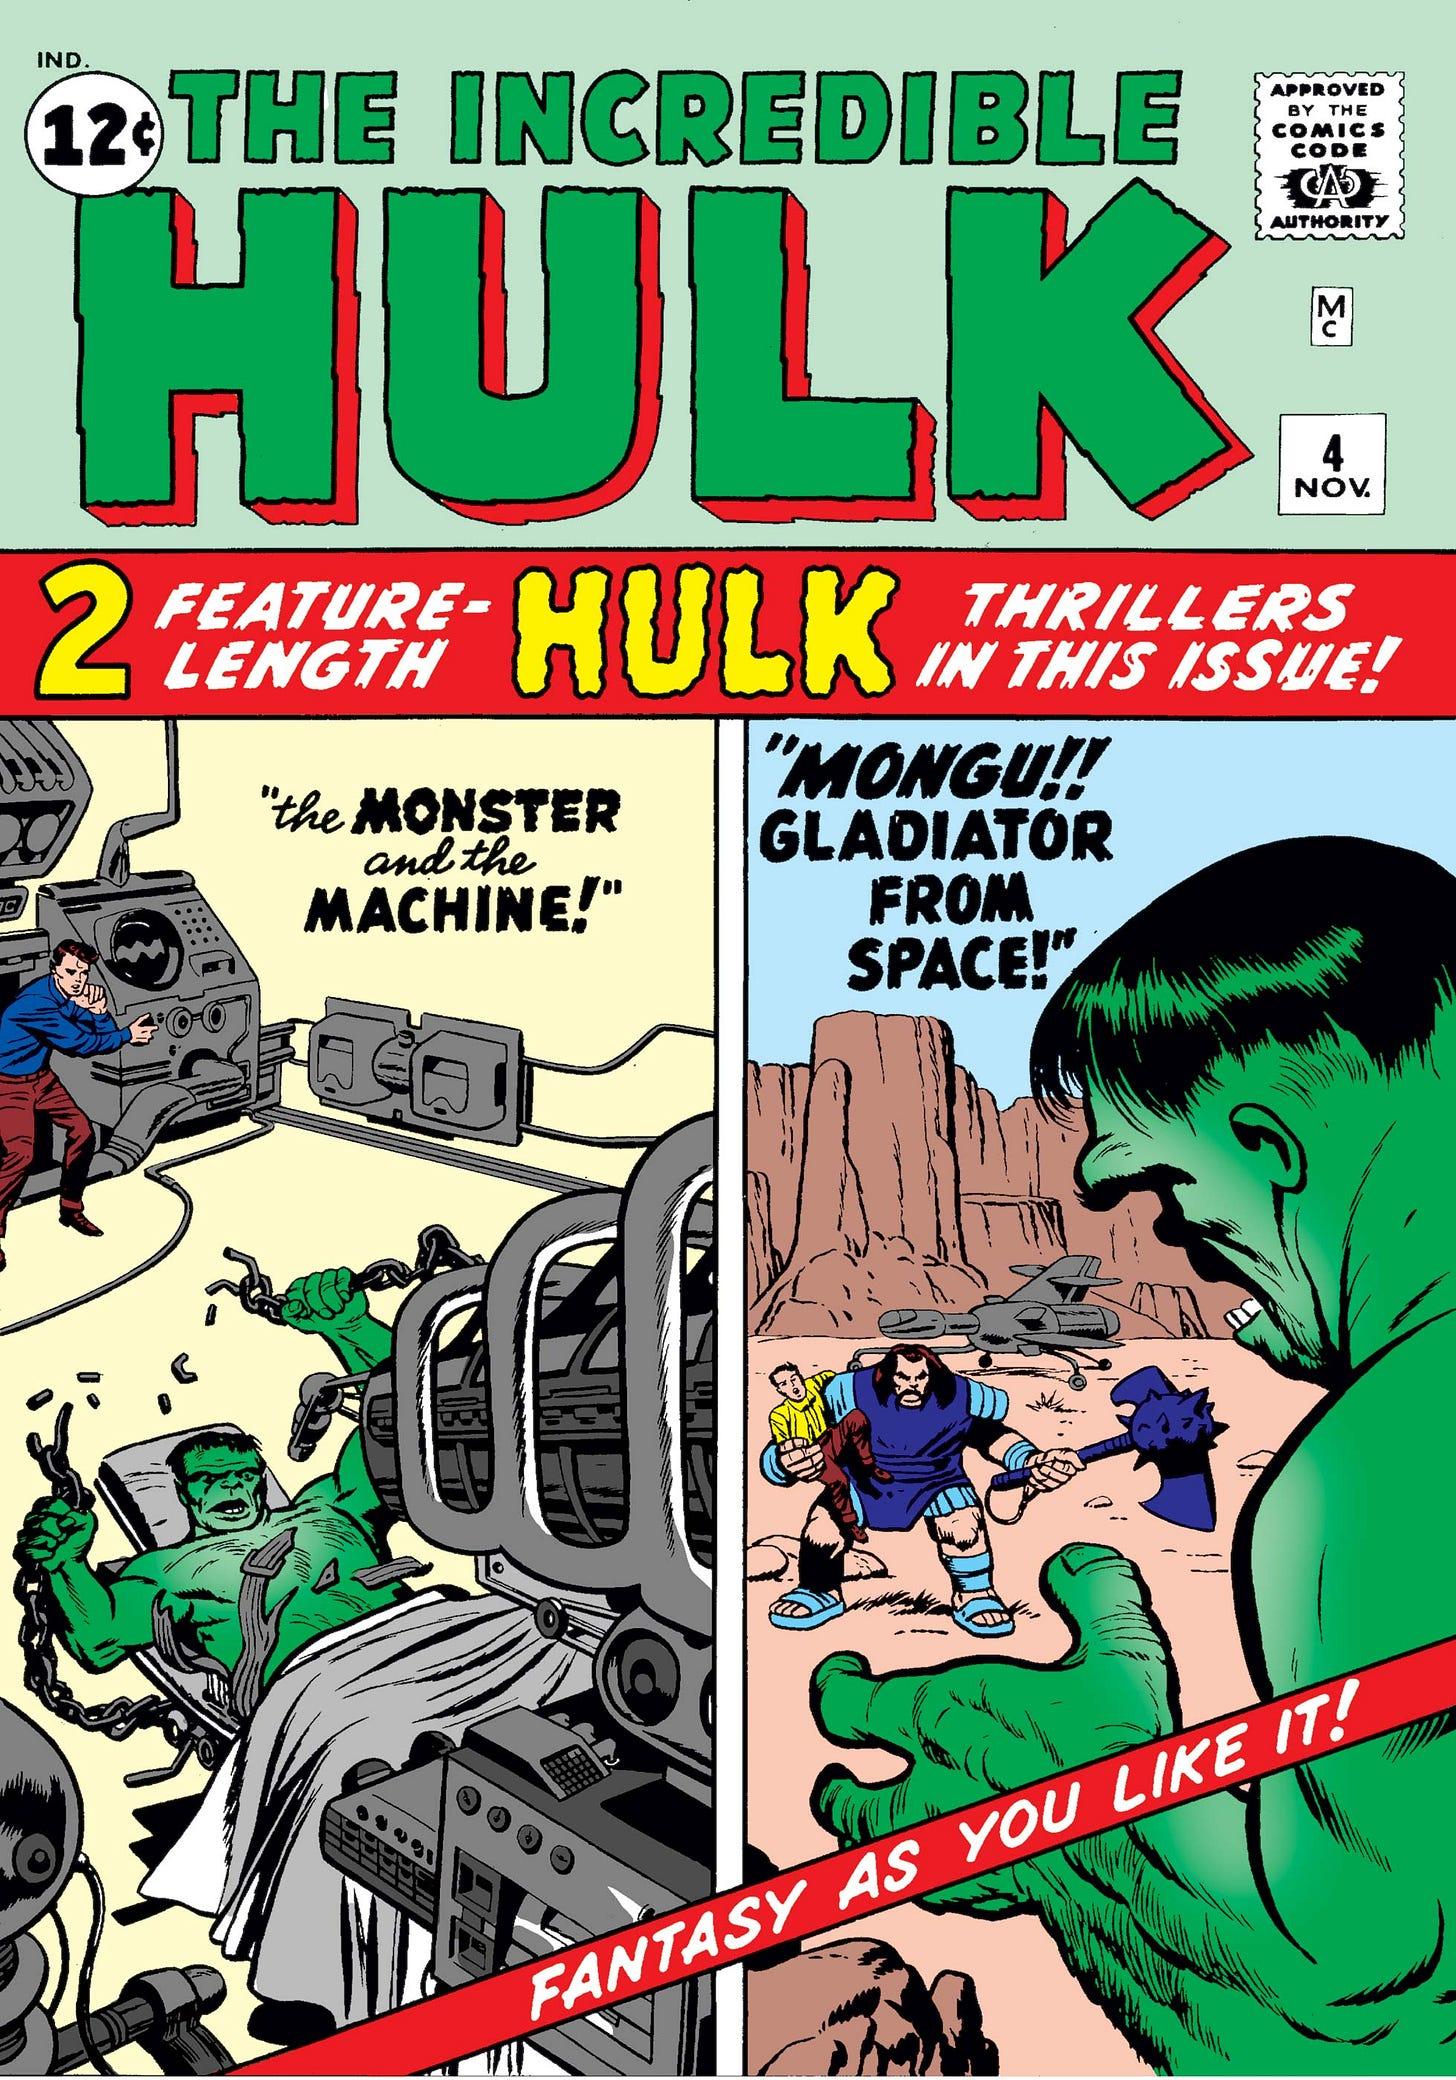 Incredible Hulk (1962) #4   Comic Issues   Marvel